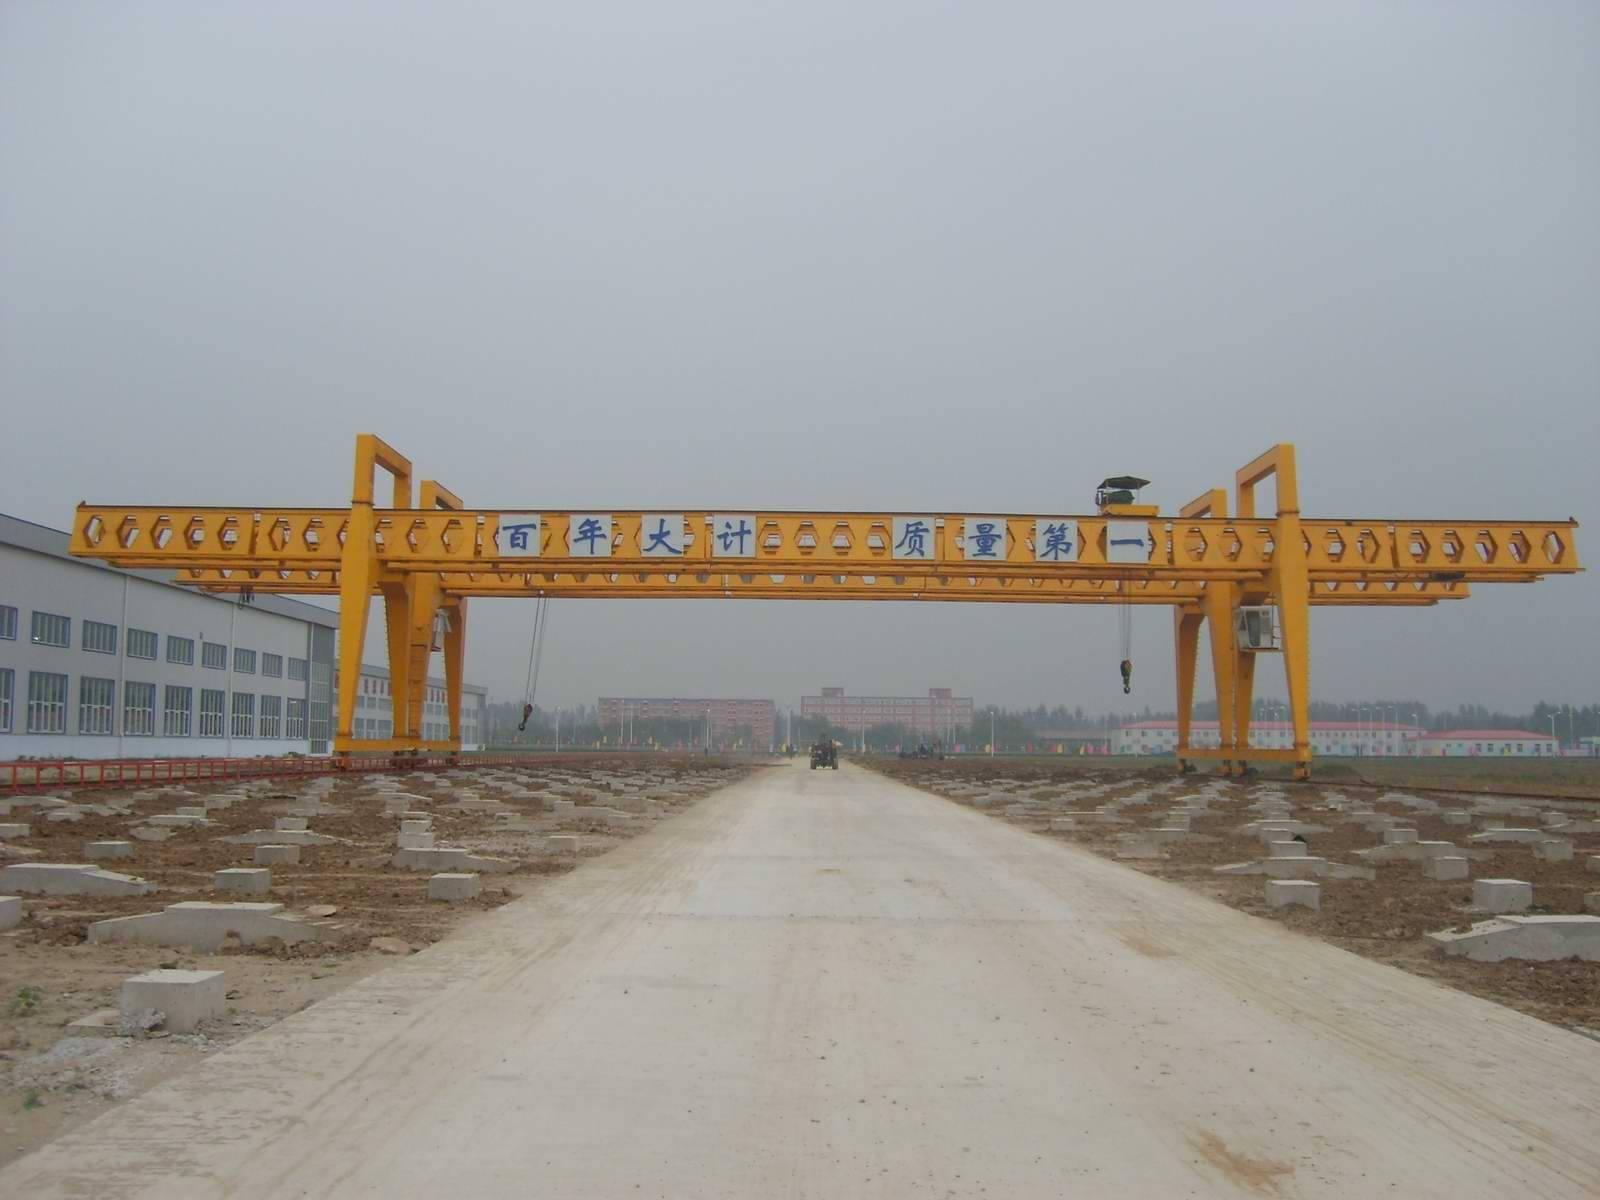 gantry crane50t to handle materials